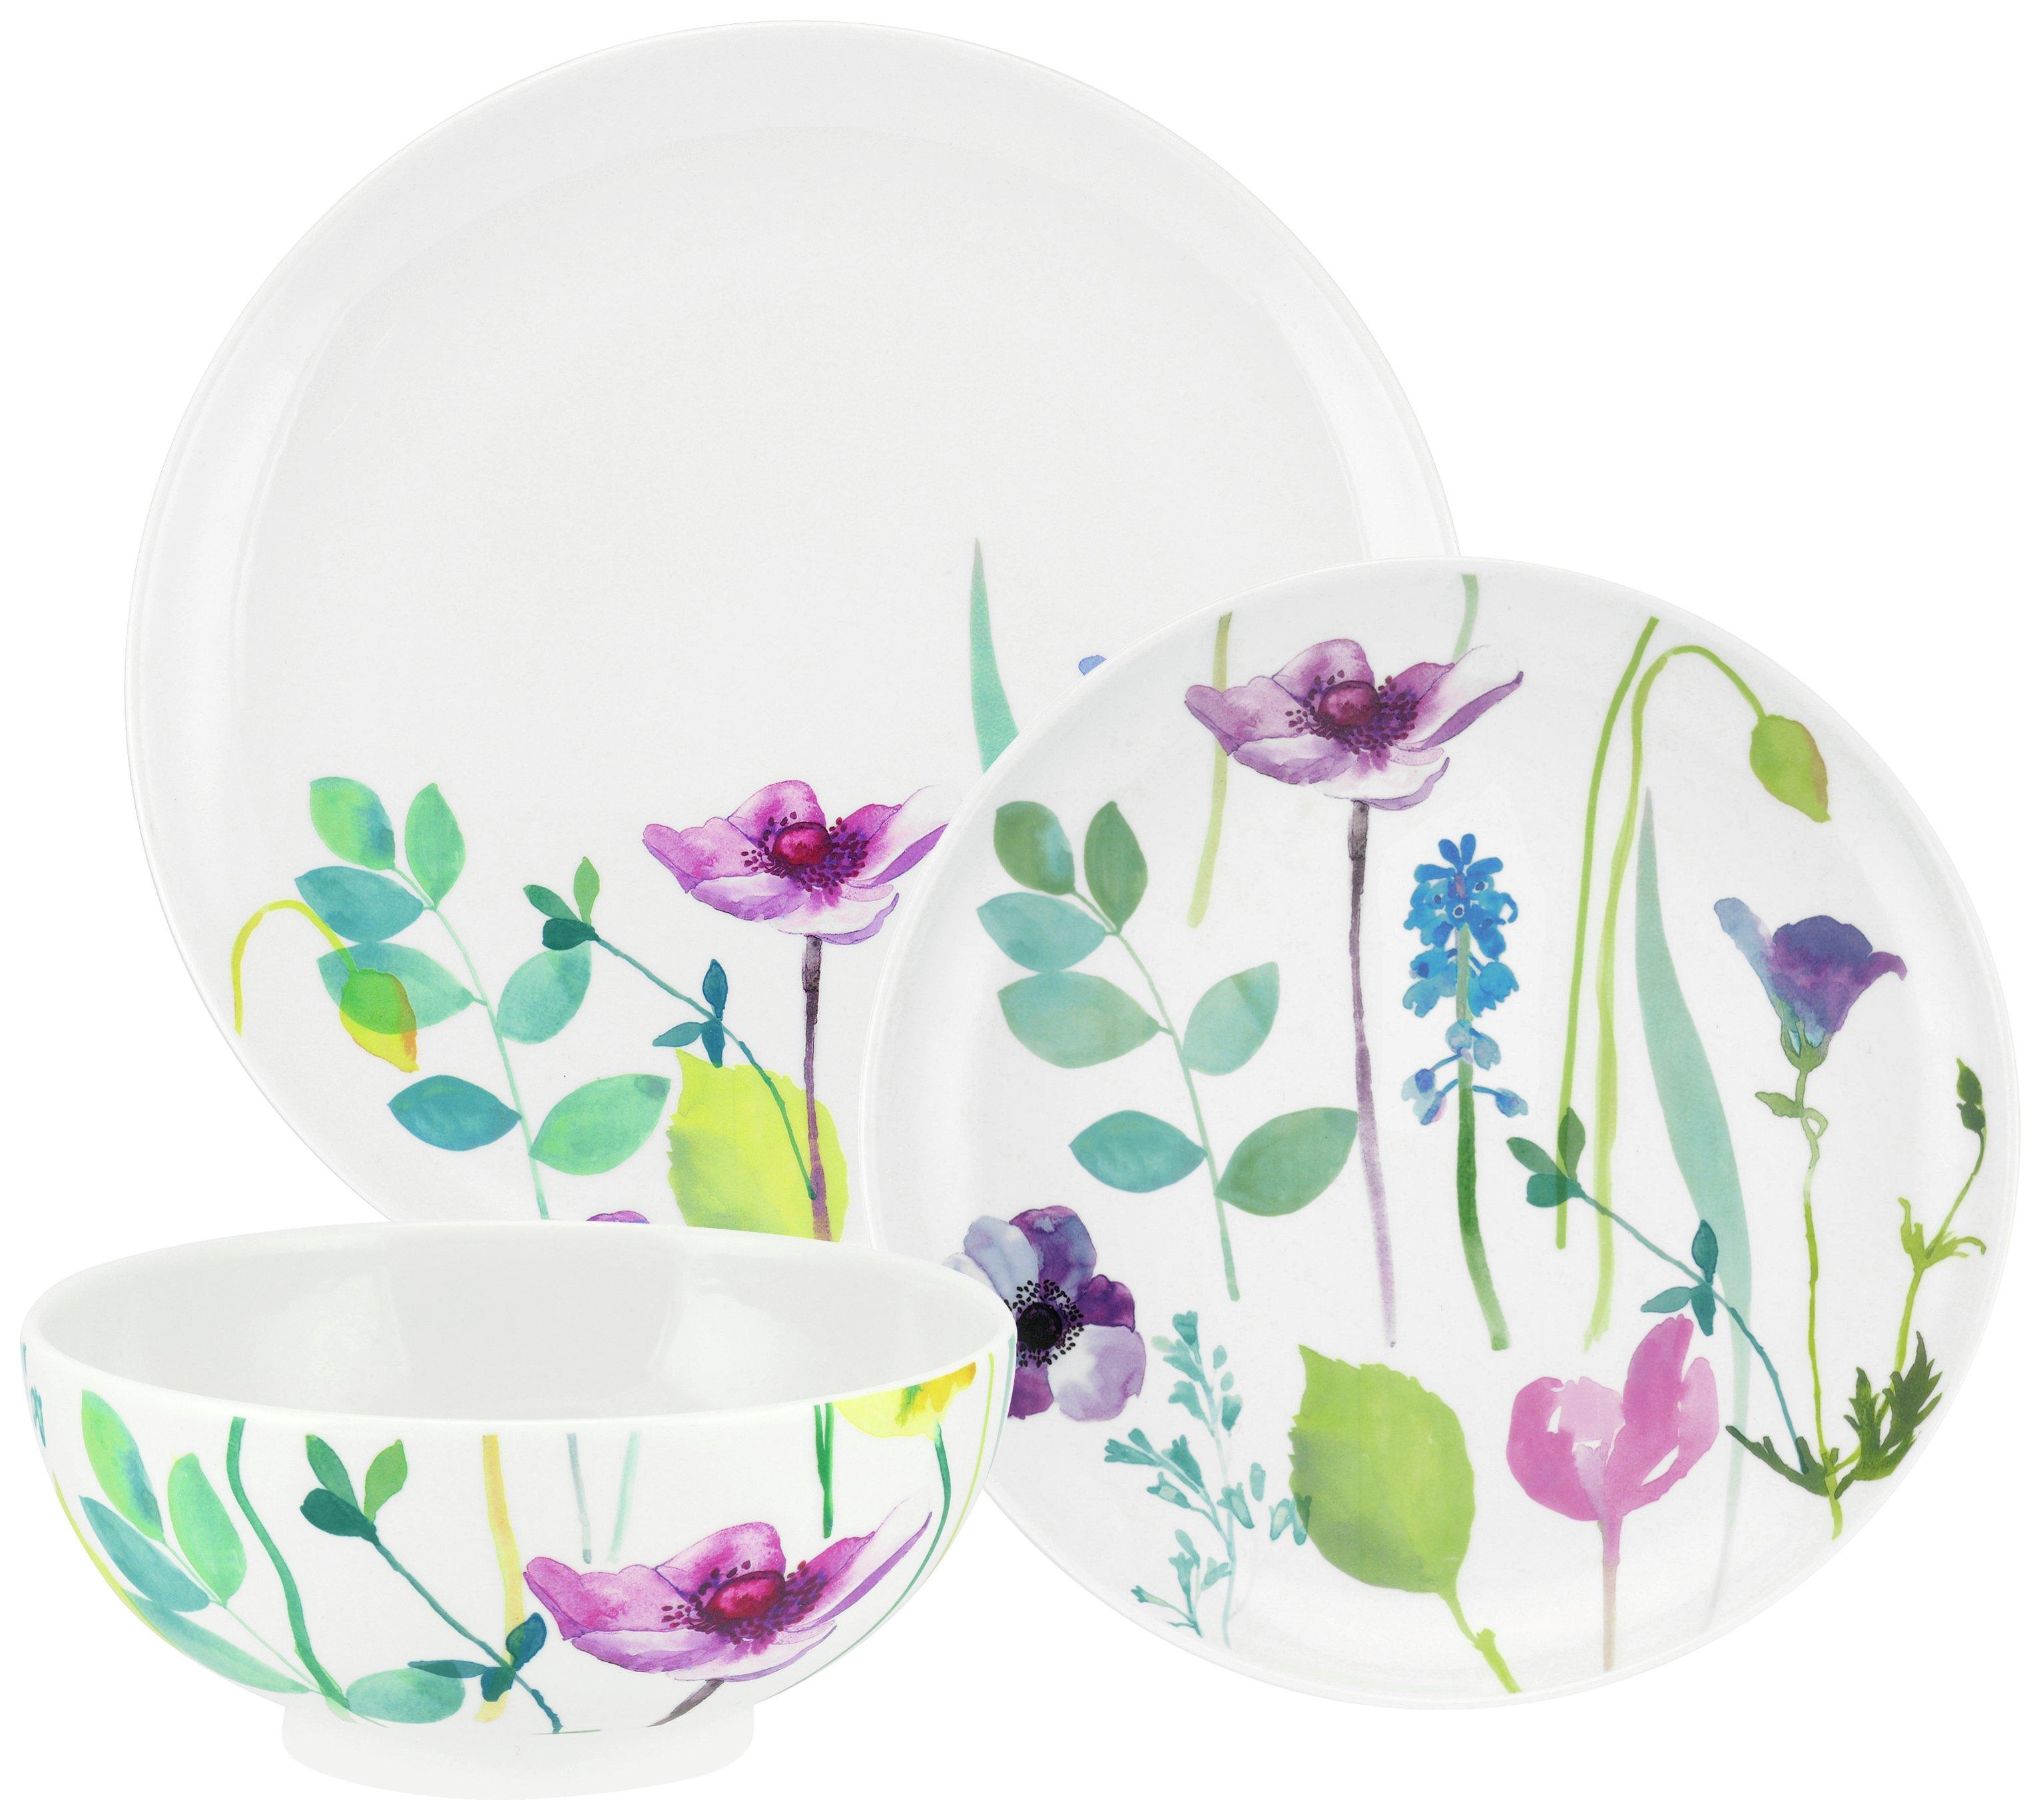 Portmeirion Water Garden 12 Piece Porcelain Dinner Set